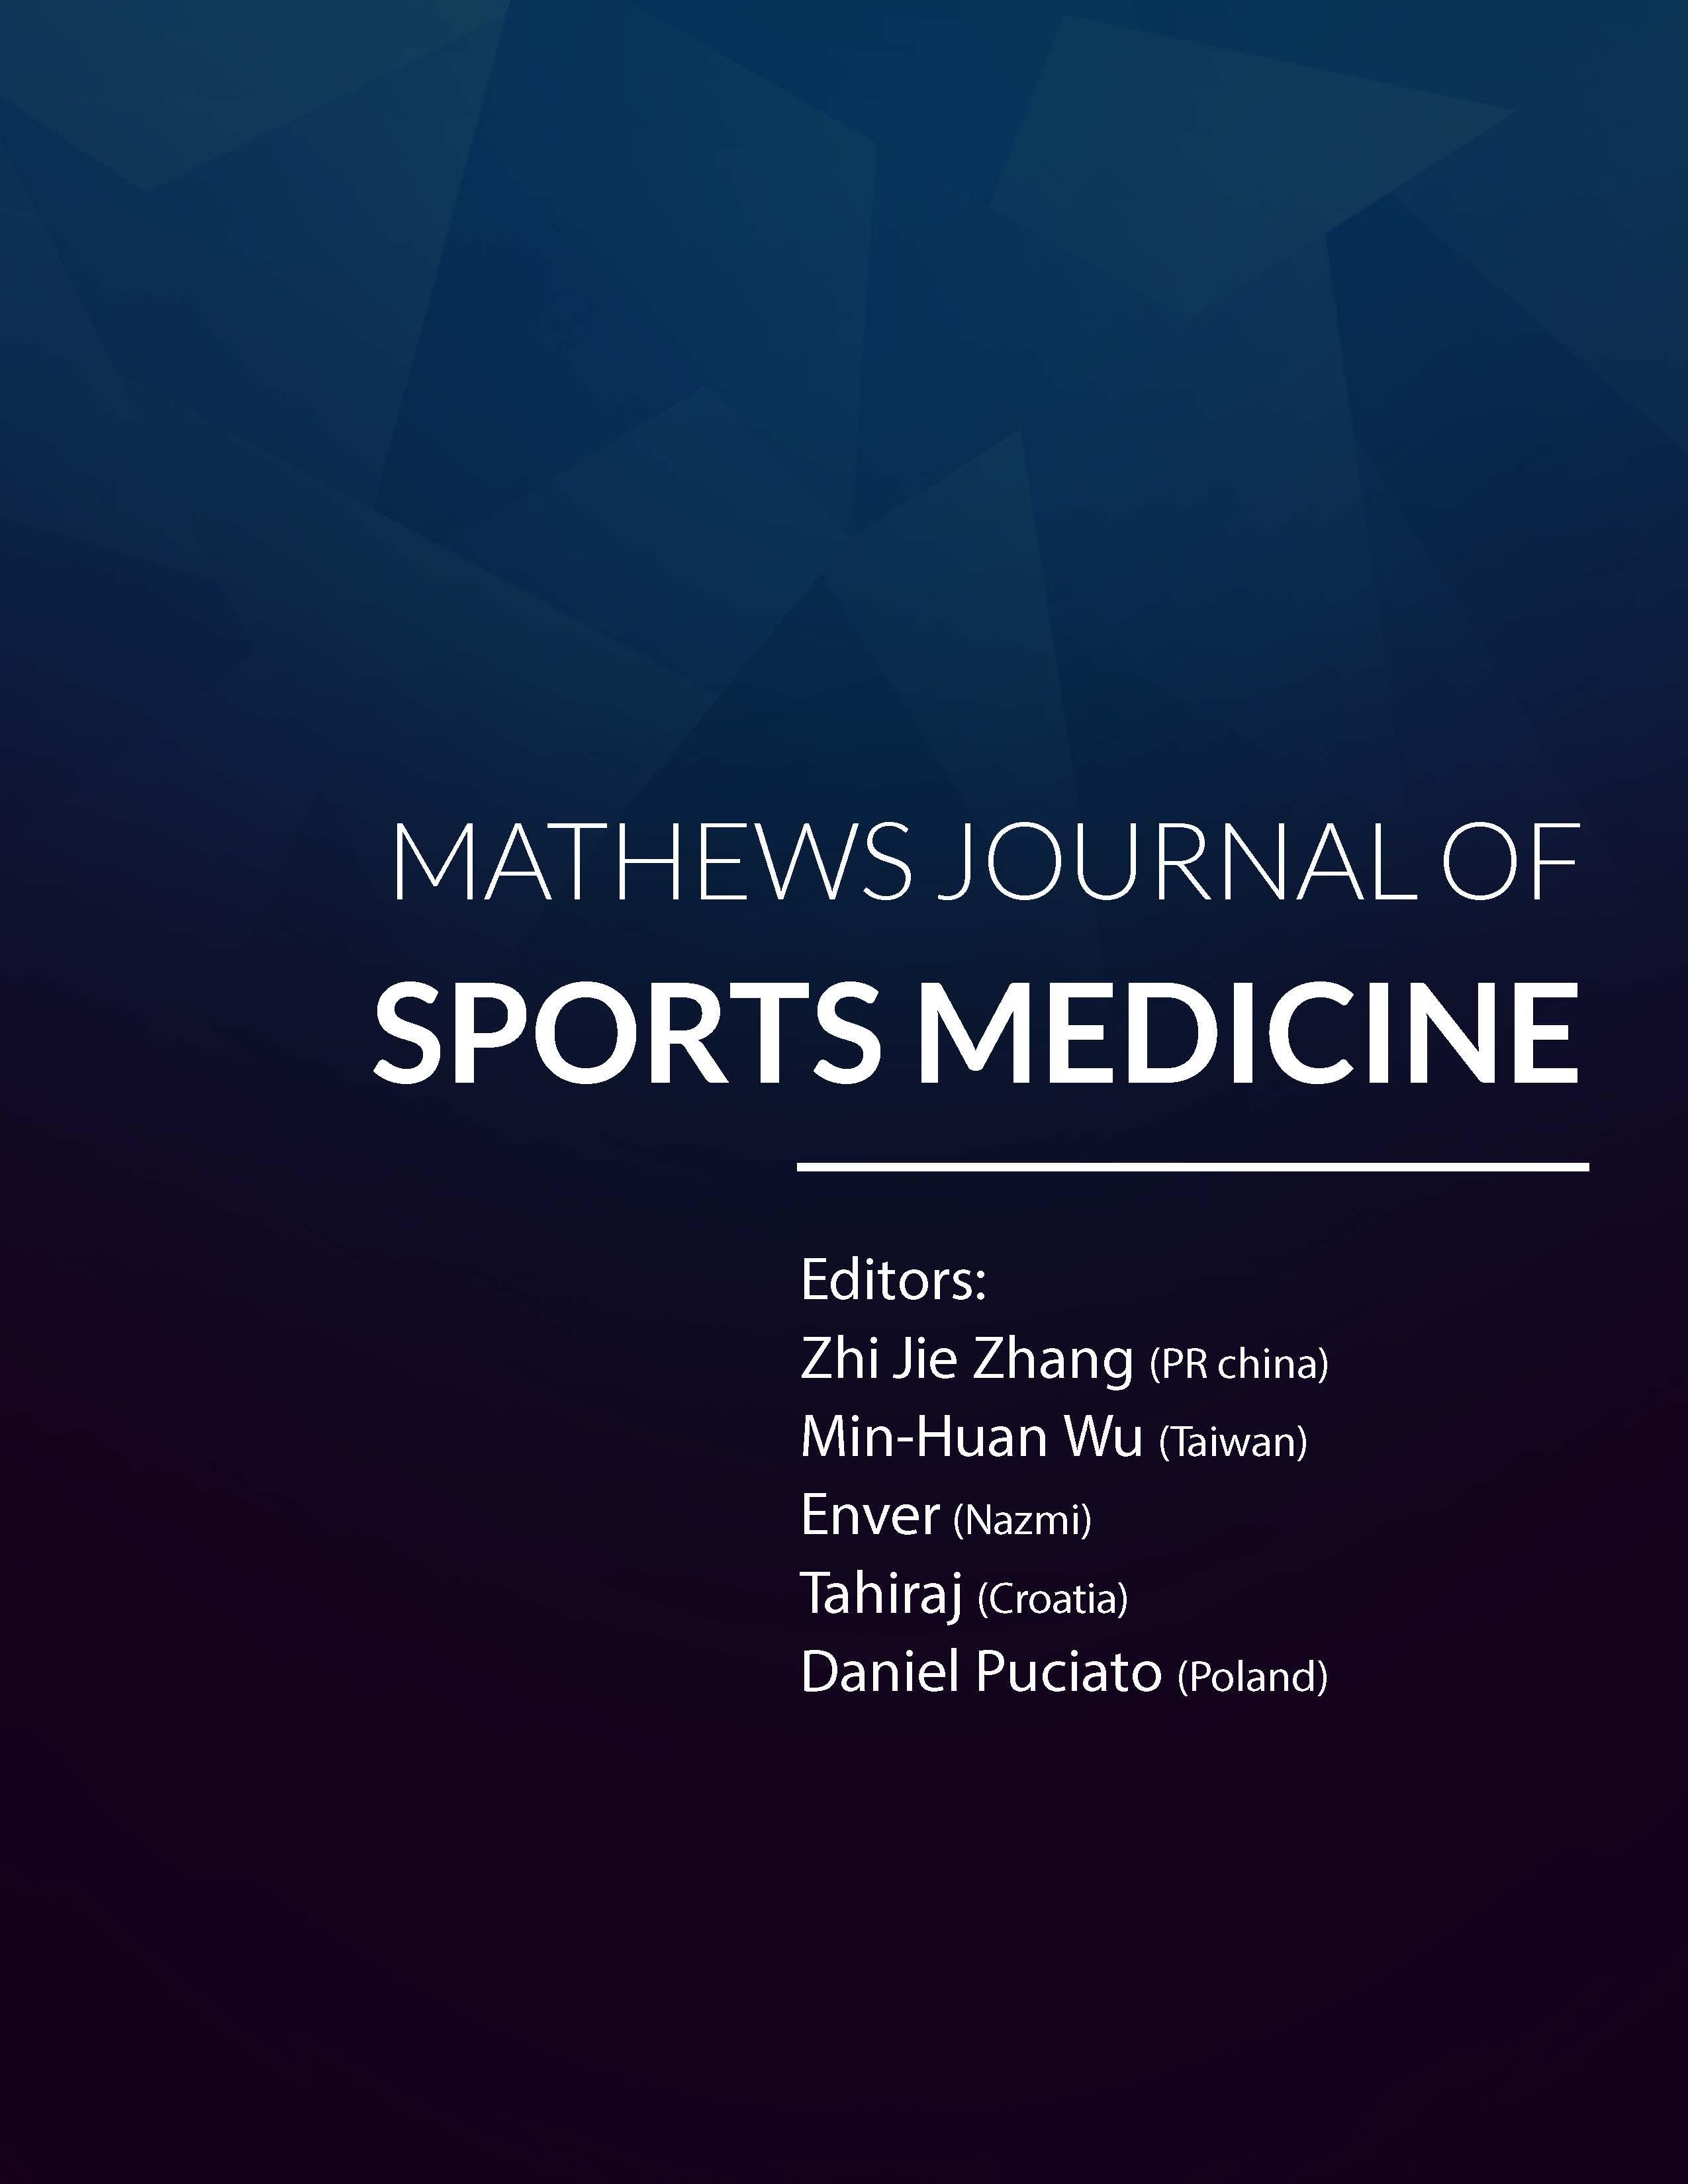 Mathews Journal of Sports Medicine